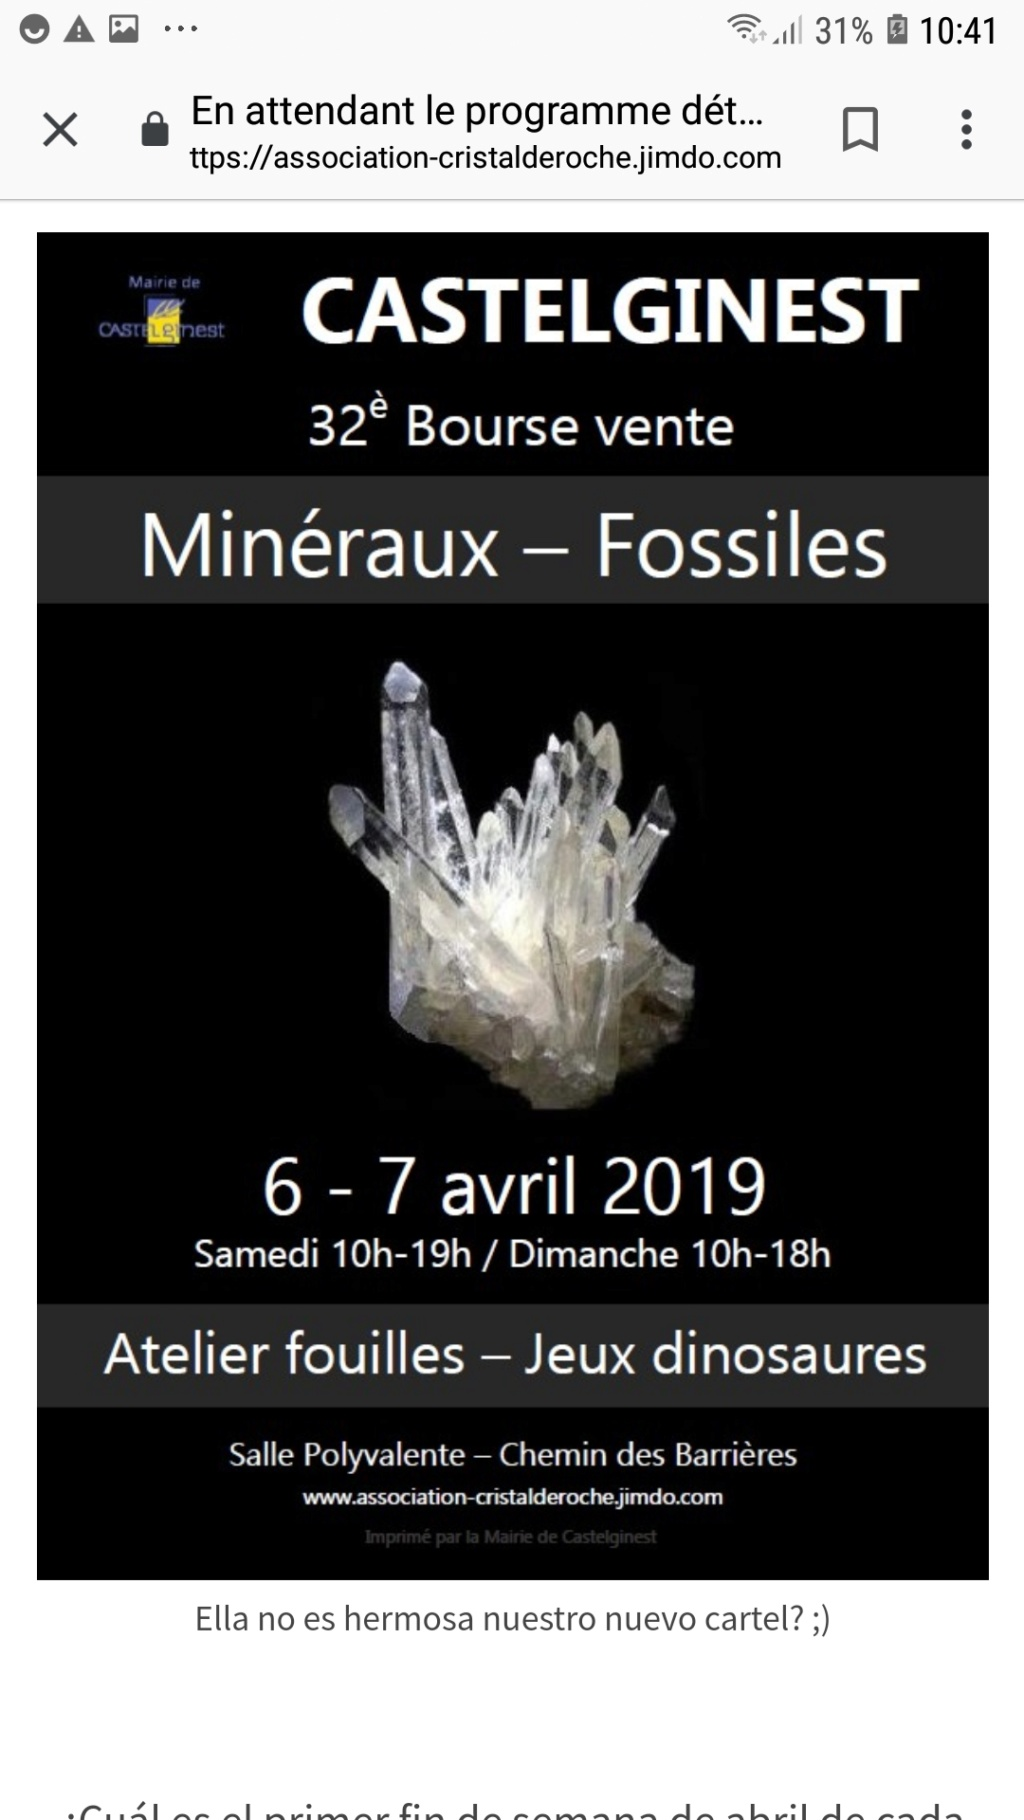 Ferias y eventos mes de Abril 2019. Screen17